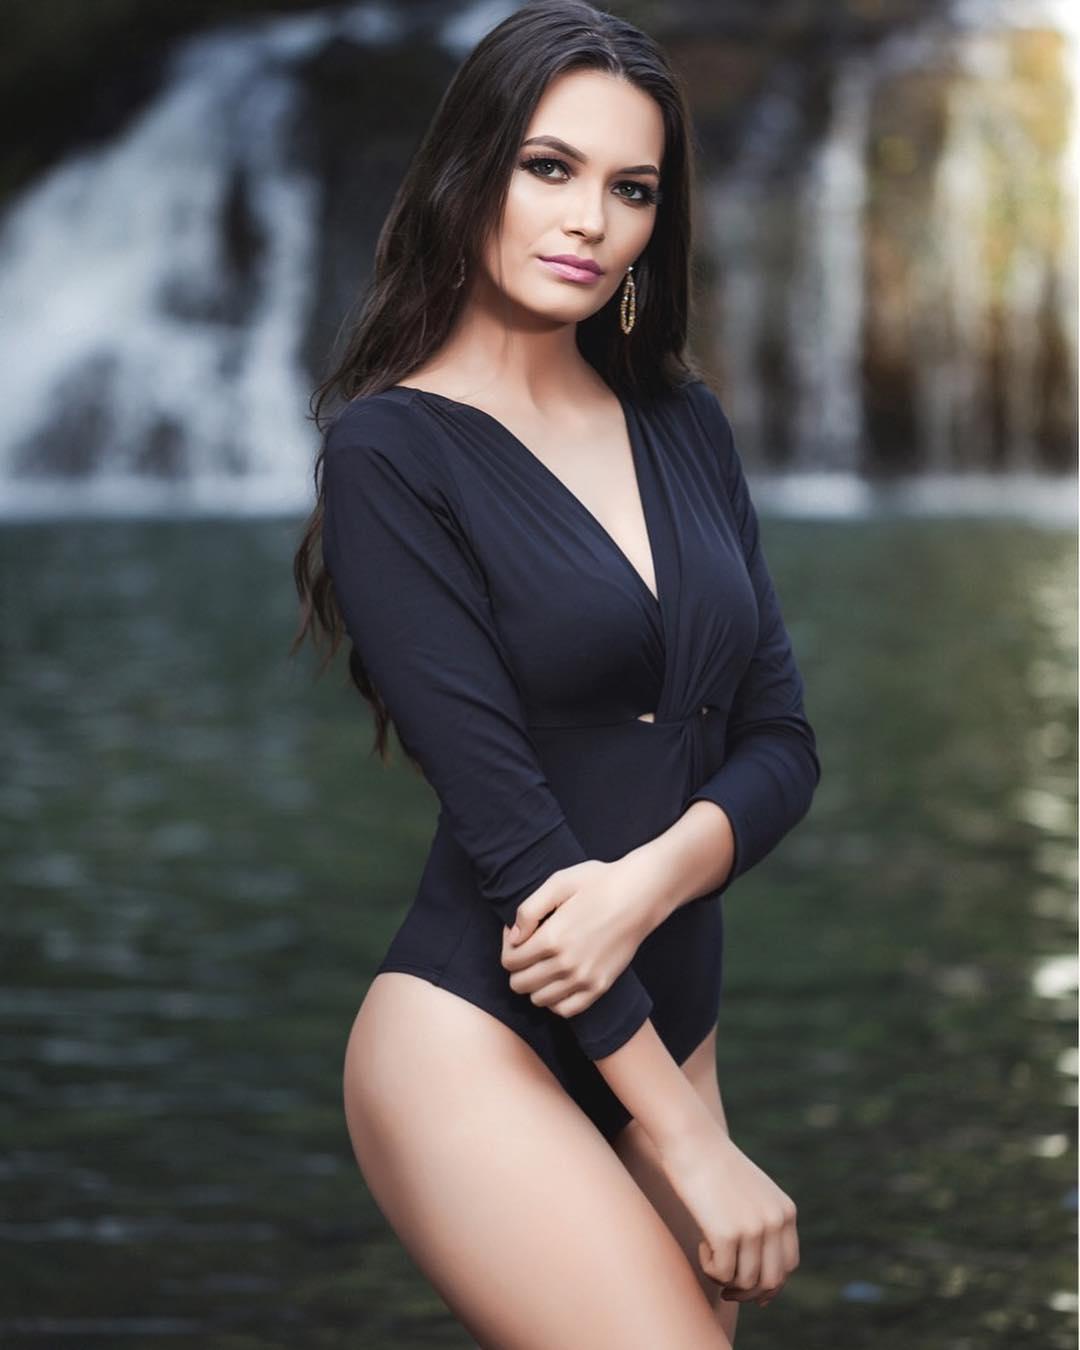 karine martovicz, miss eco fernando de noronha 2019. 34080710